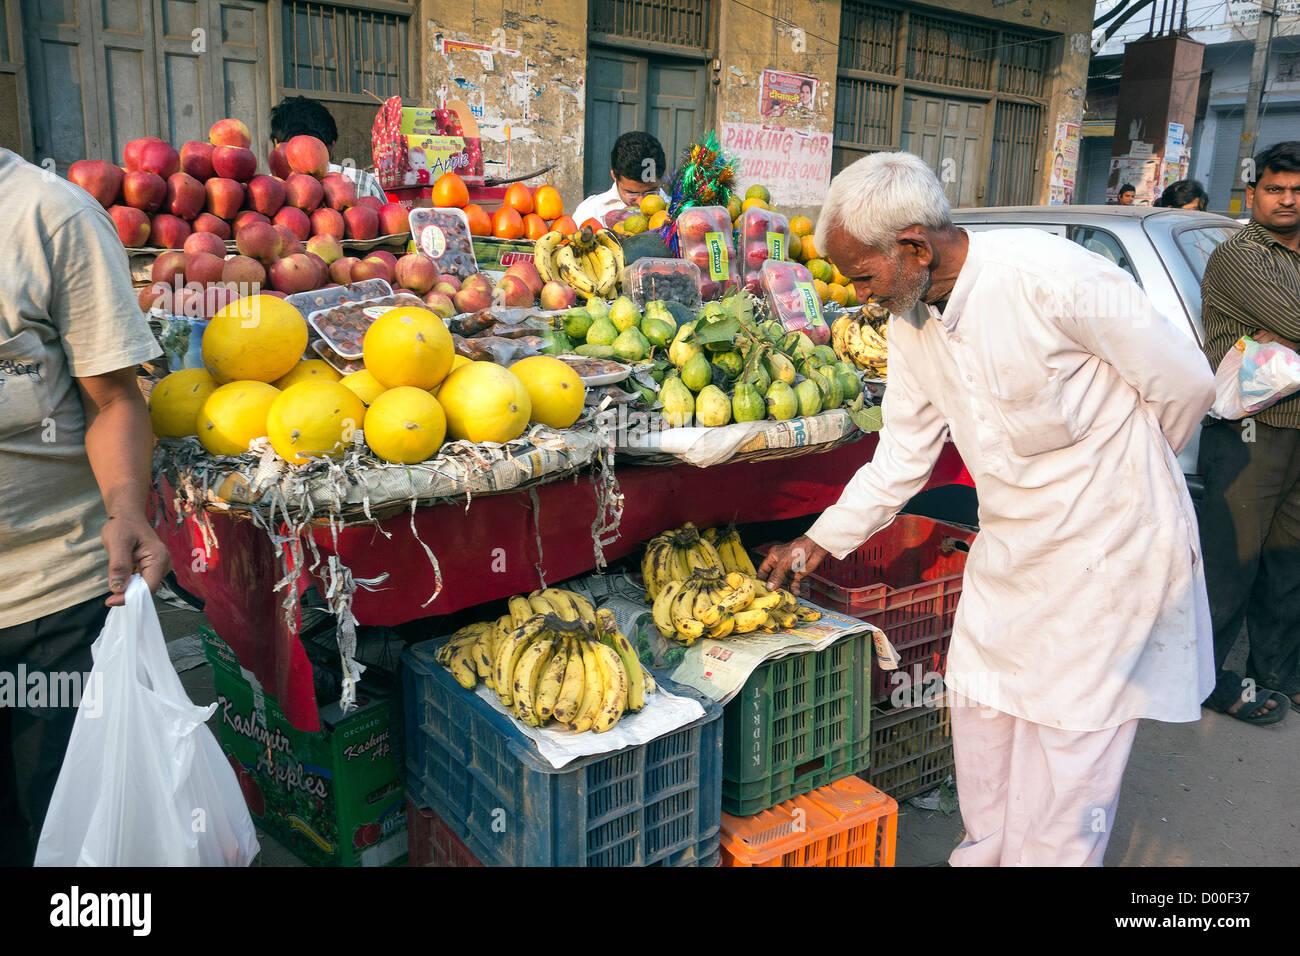 Kamla Nagar Market Old Delhi Business Commercial Hub Center Traffic Vendors Roadside - Stock Image